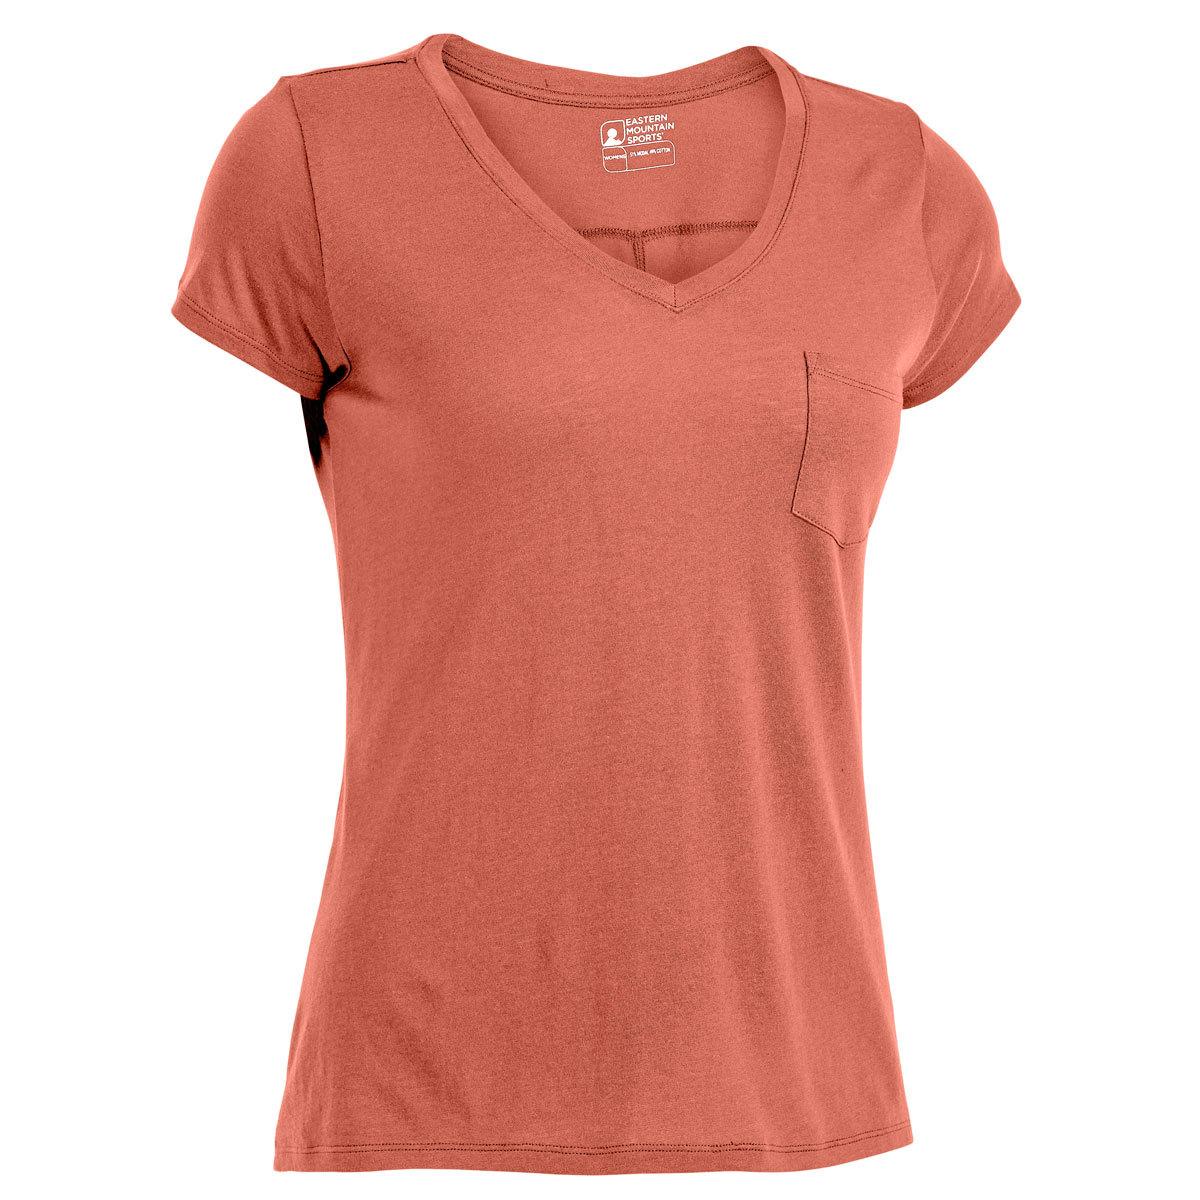 Ems Women's Serenity V-Neck Short-Sleeve Pocket Tee - Red, XL